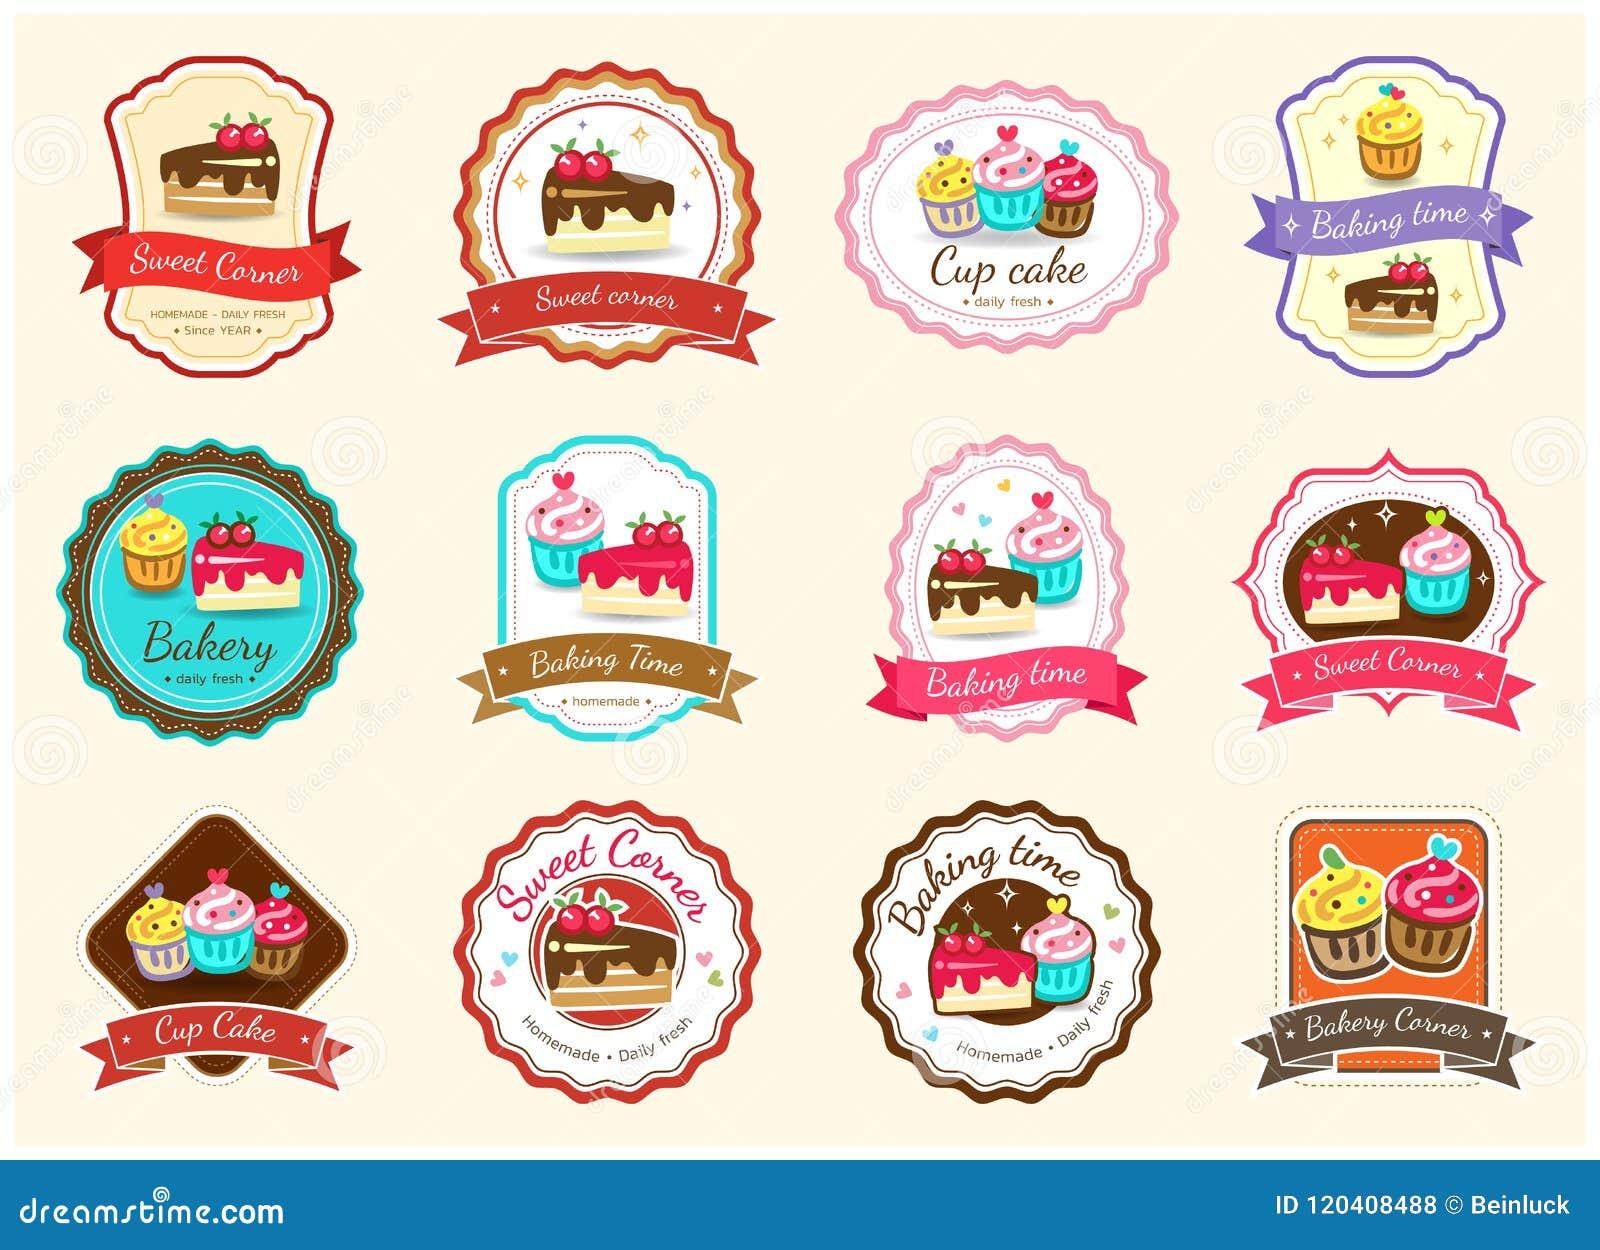 Комплект милого сладостного ярлыка и логотипа значка хлебопекарни